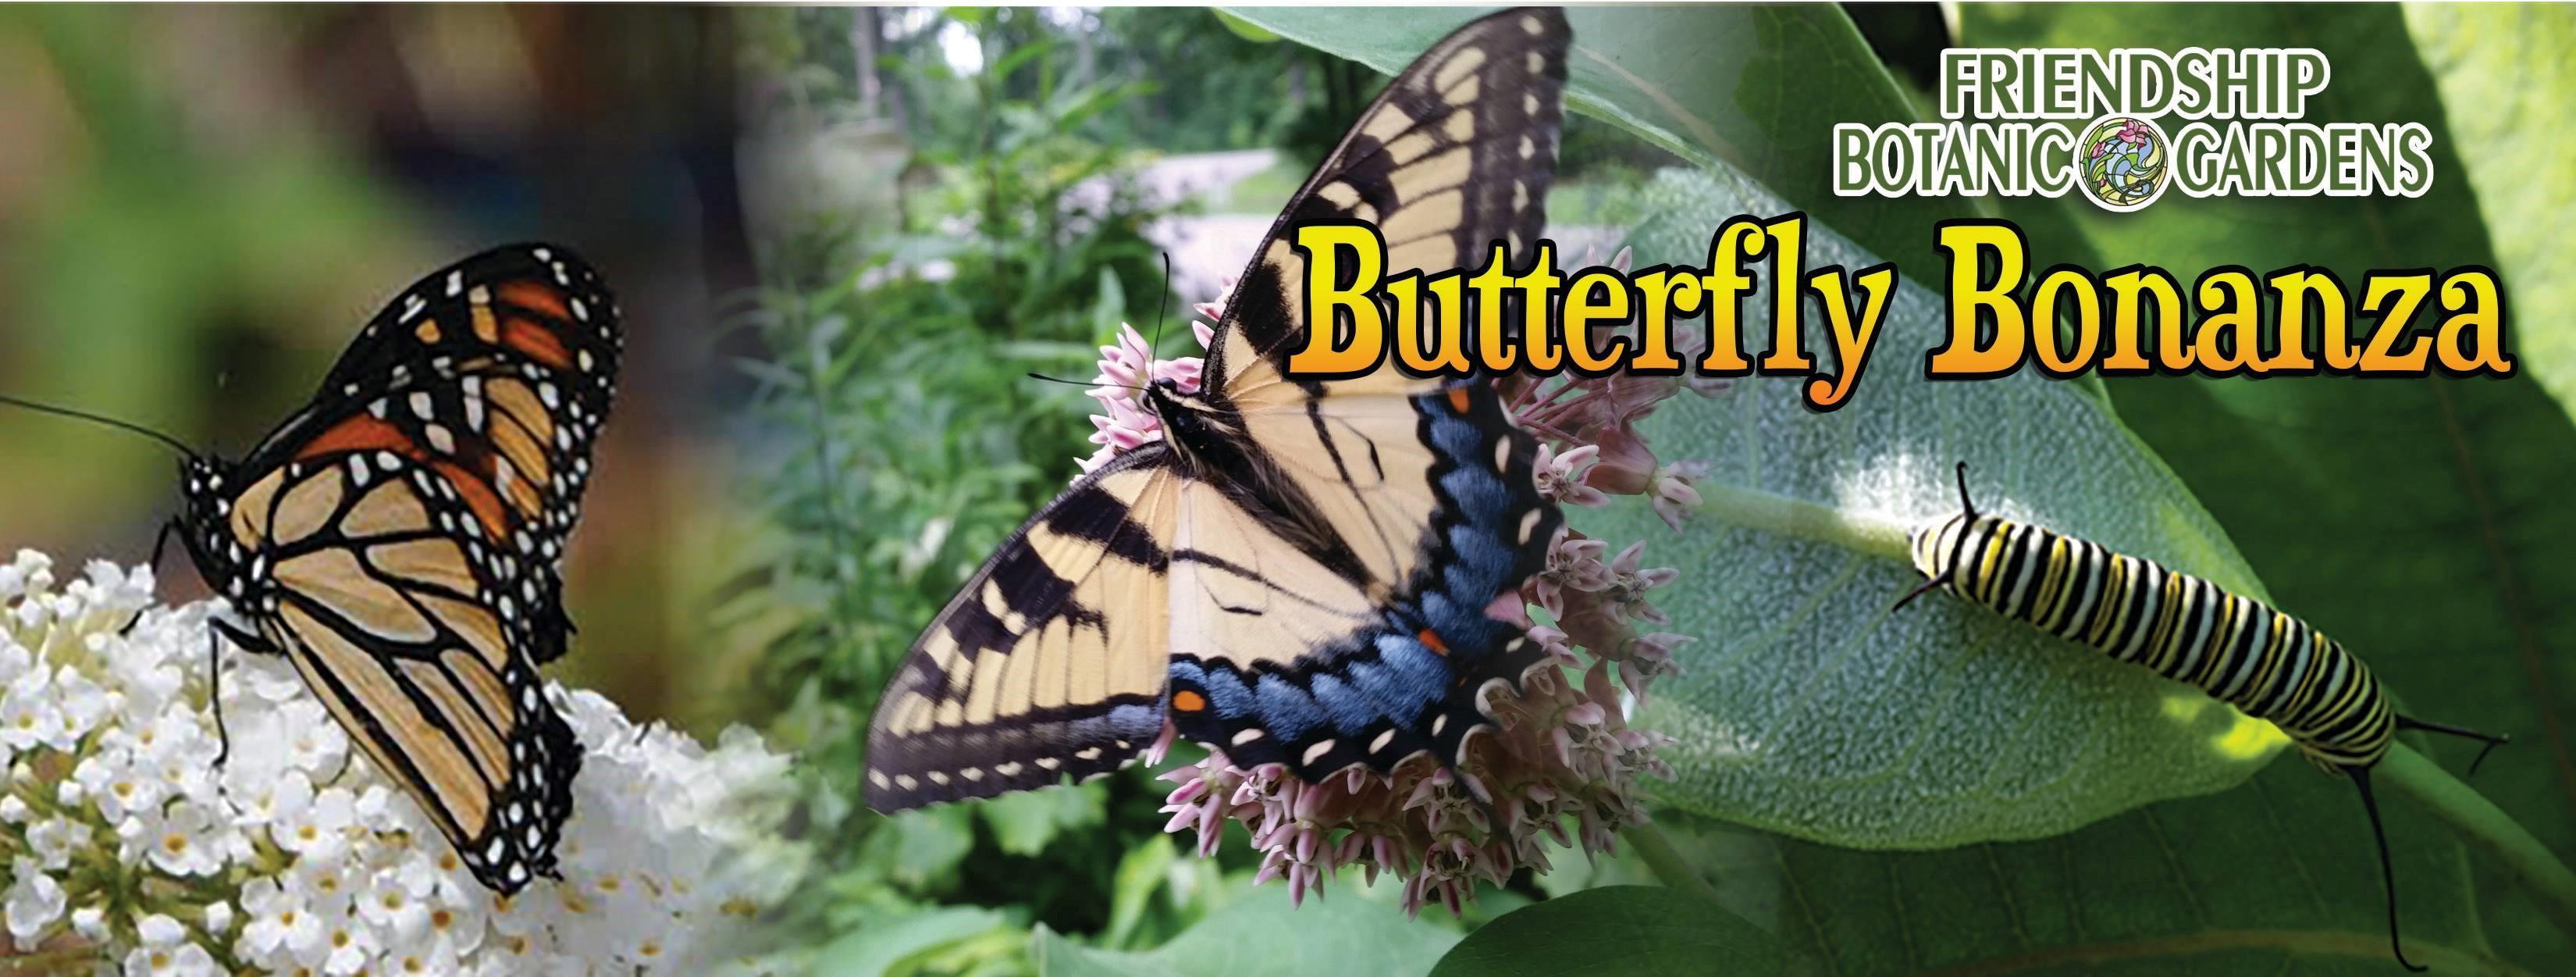 Butterfly Bonanza Returns to Friendship Botanic Gardens